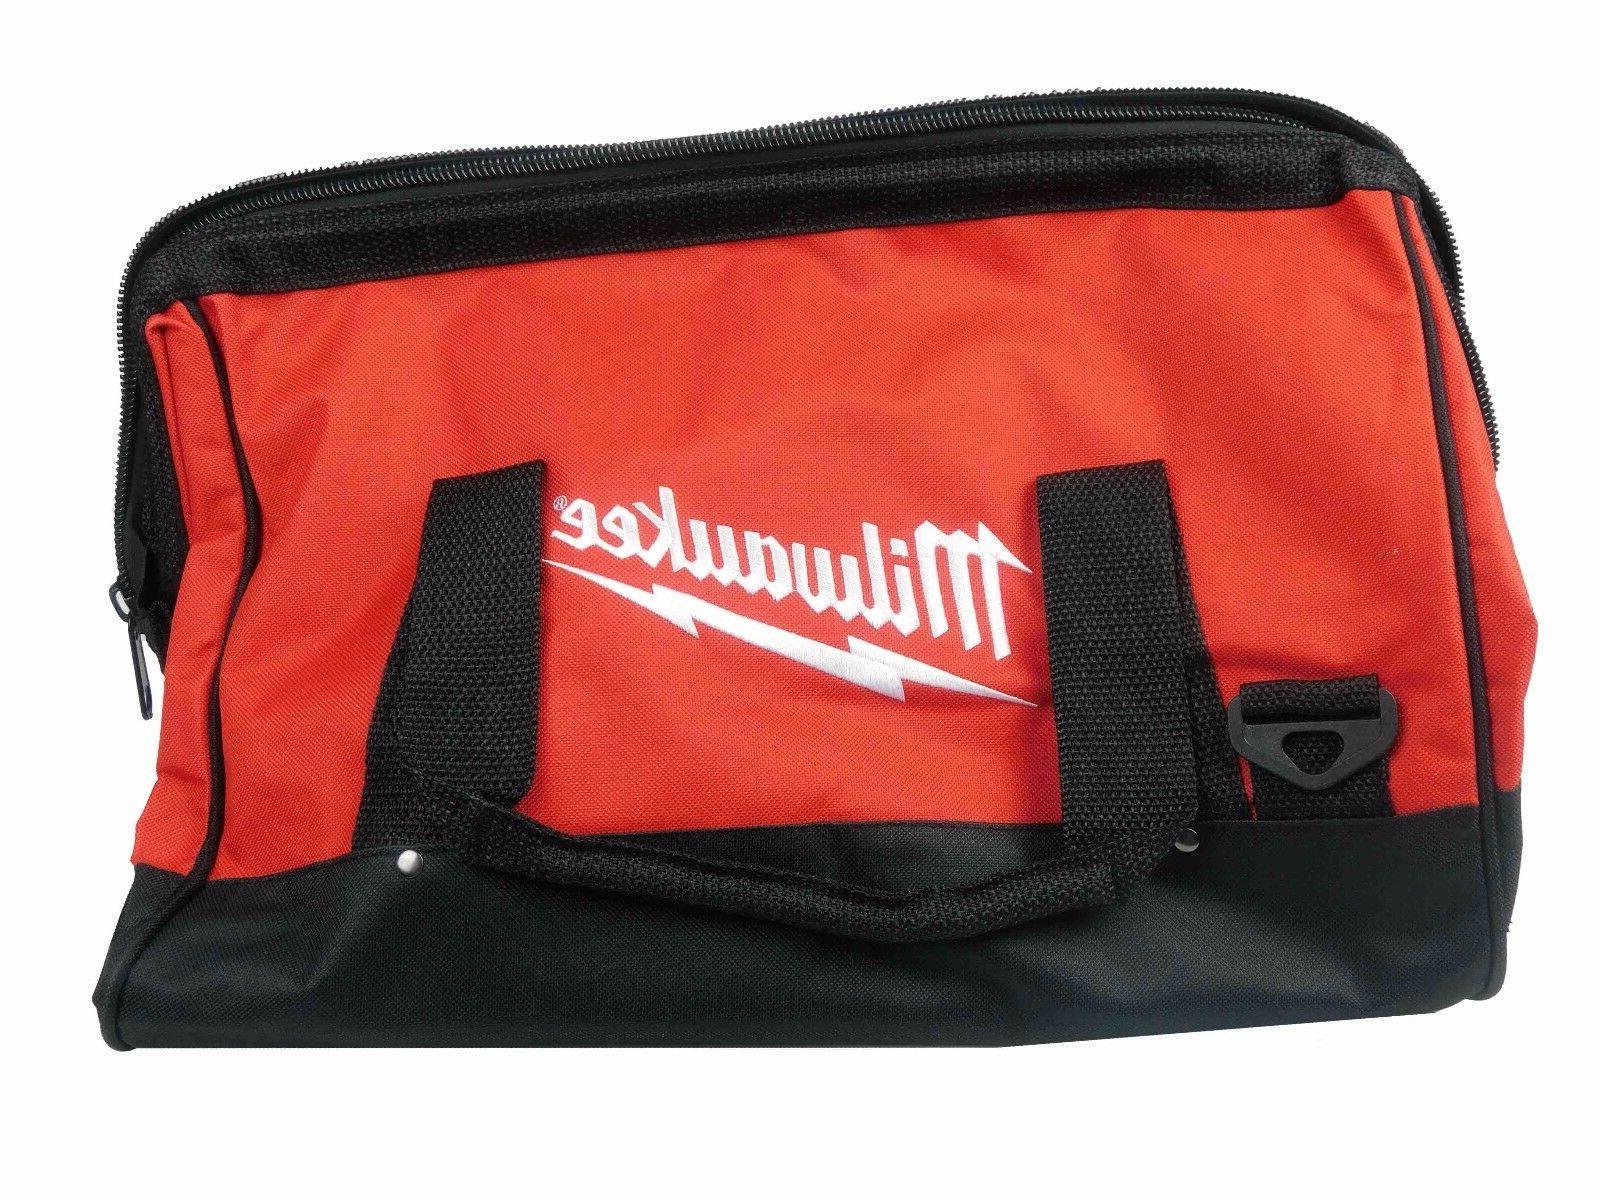 Milwaukee 6-Pocket Duty Industrial Tool